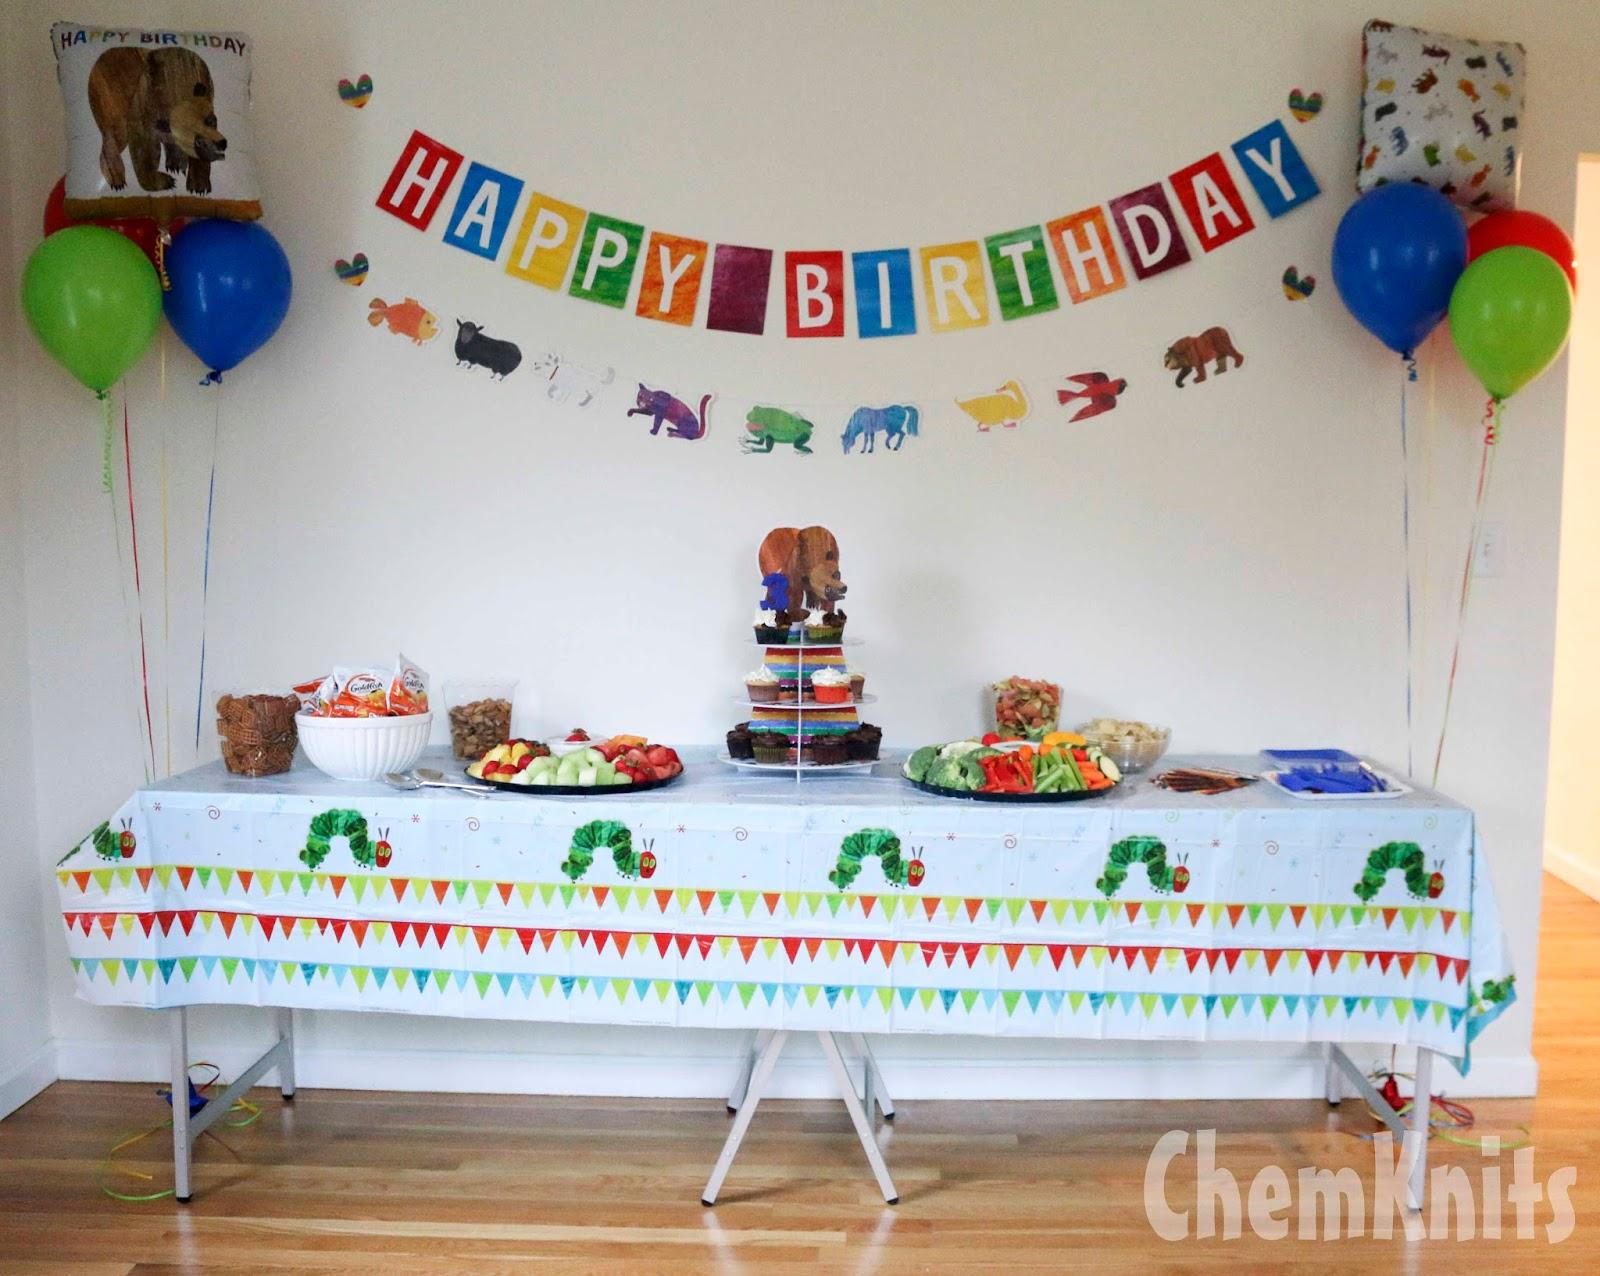 ChemKnits: An Eric Carle (Brown Bear, Brown Bear) Birthday Party!